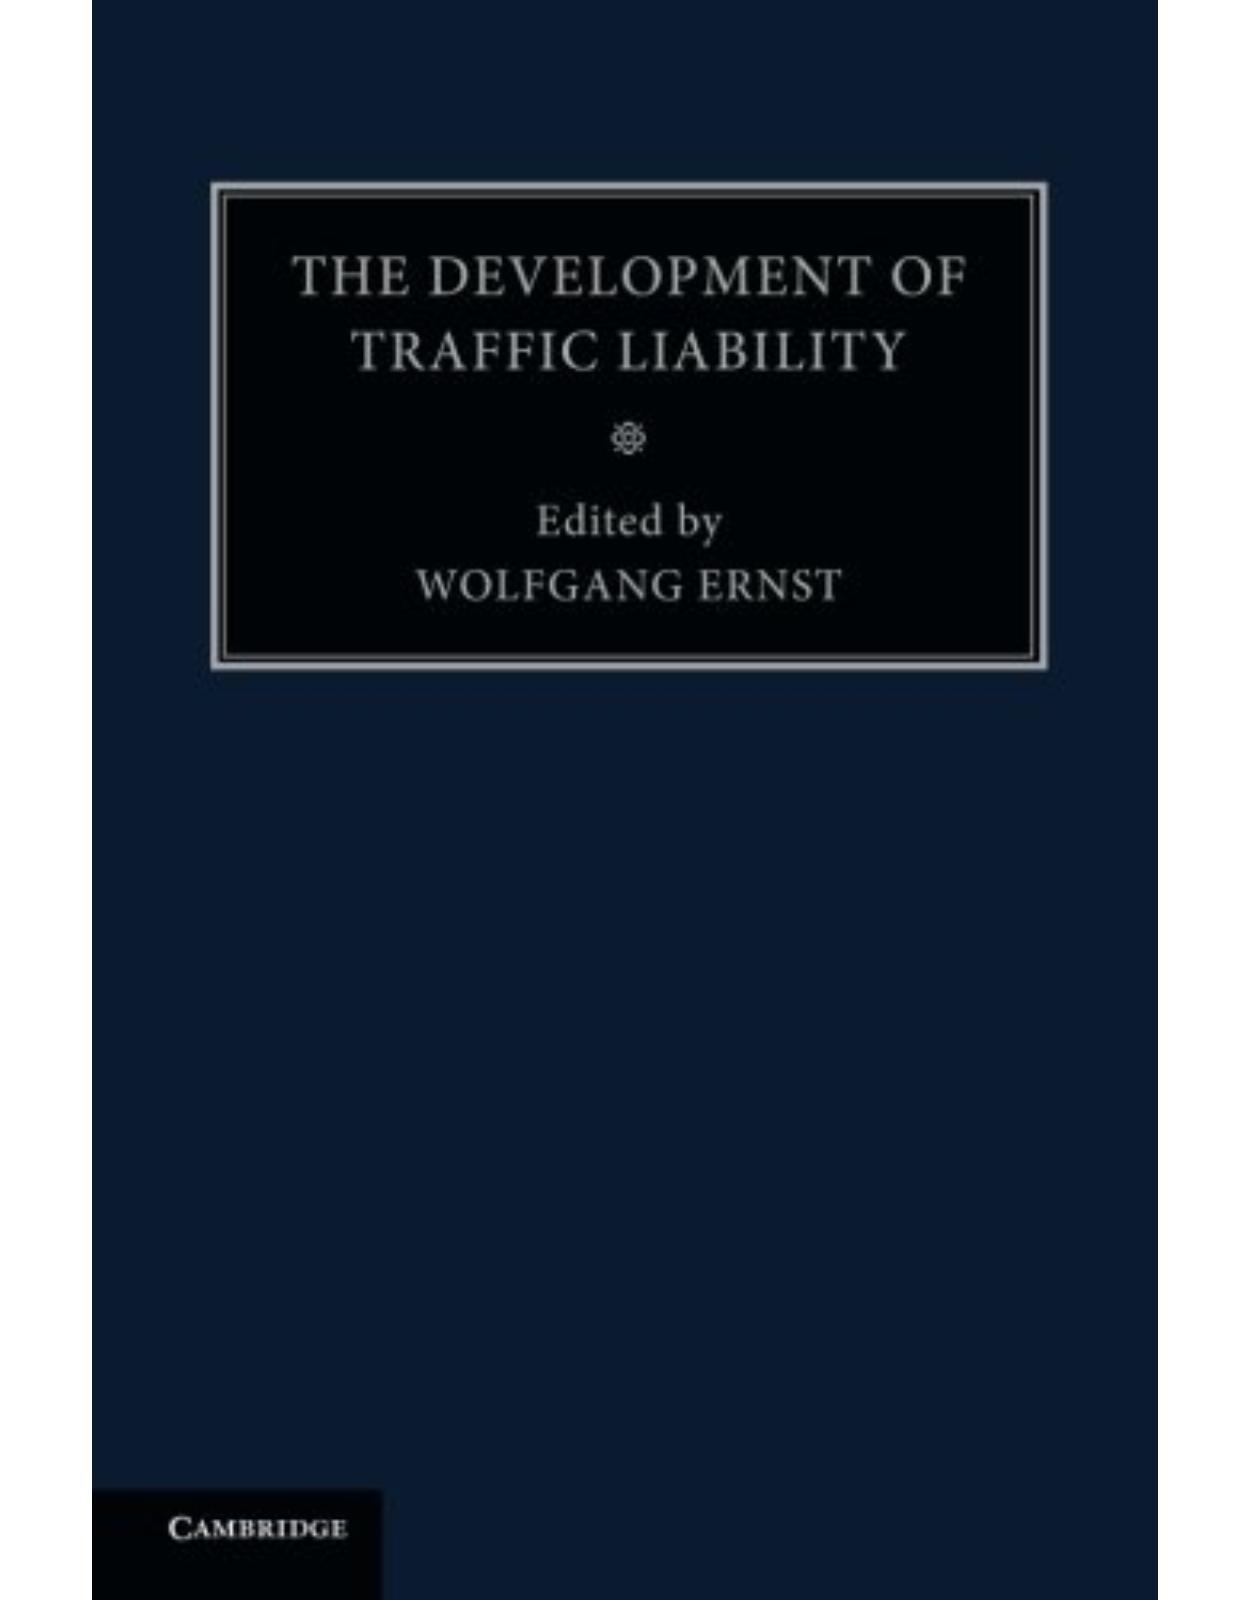 The Development of Traffic Liability: Volume 5